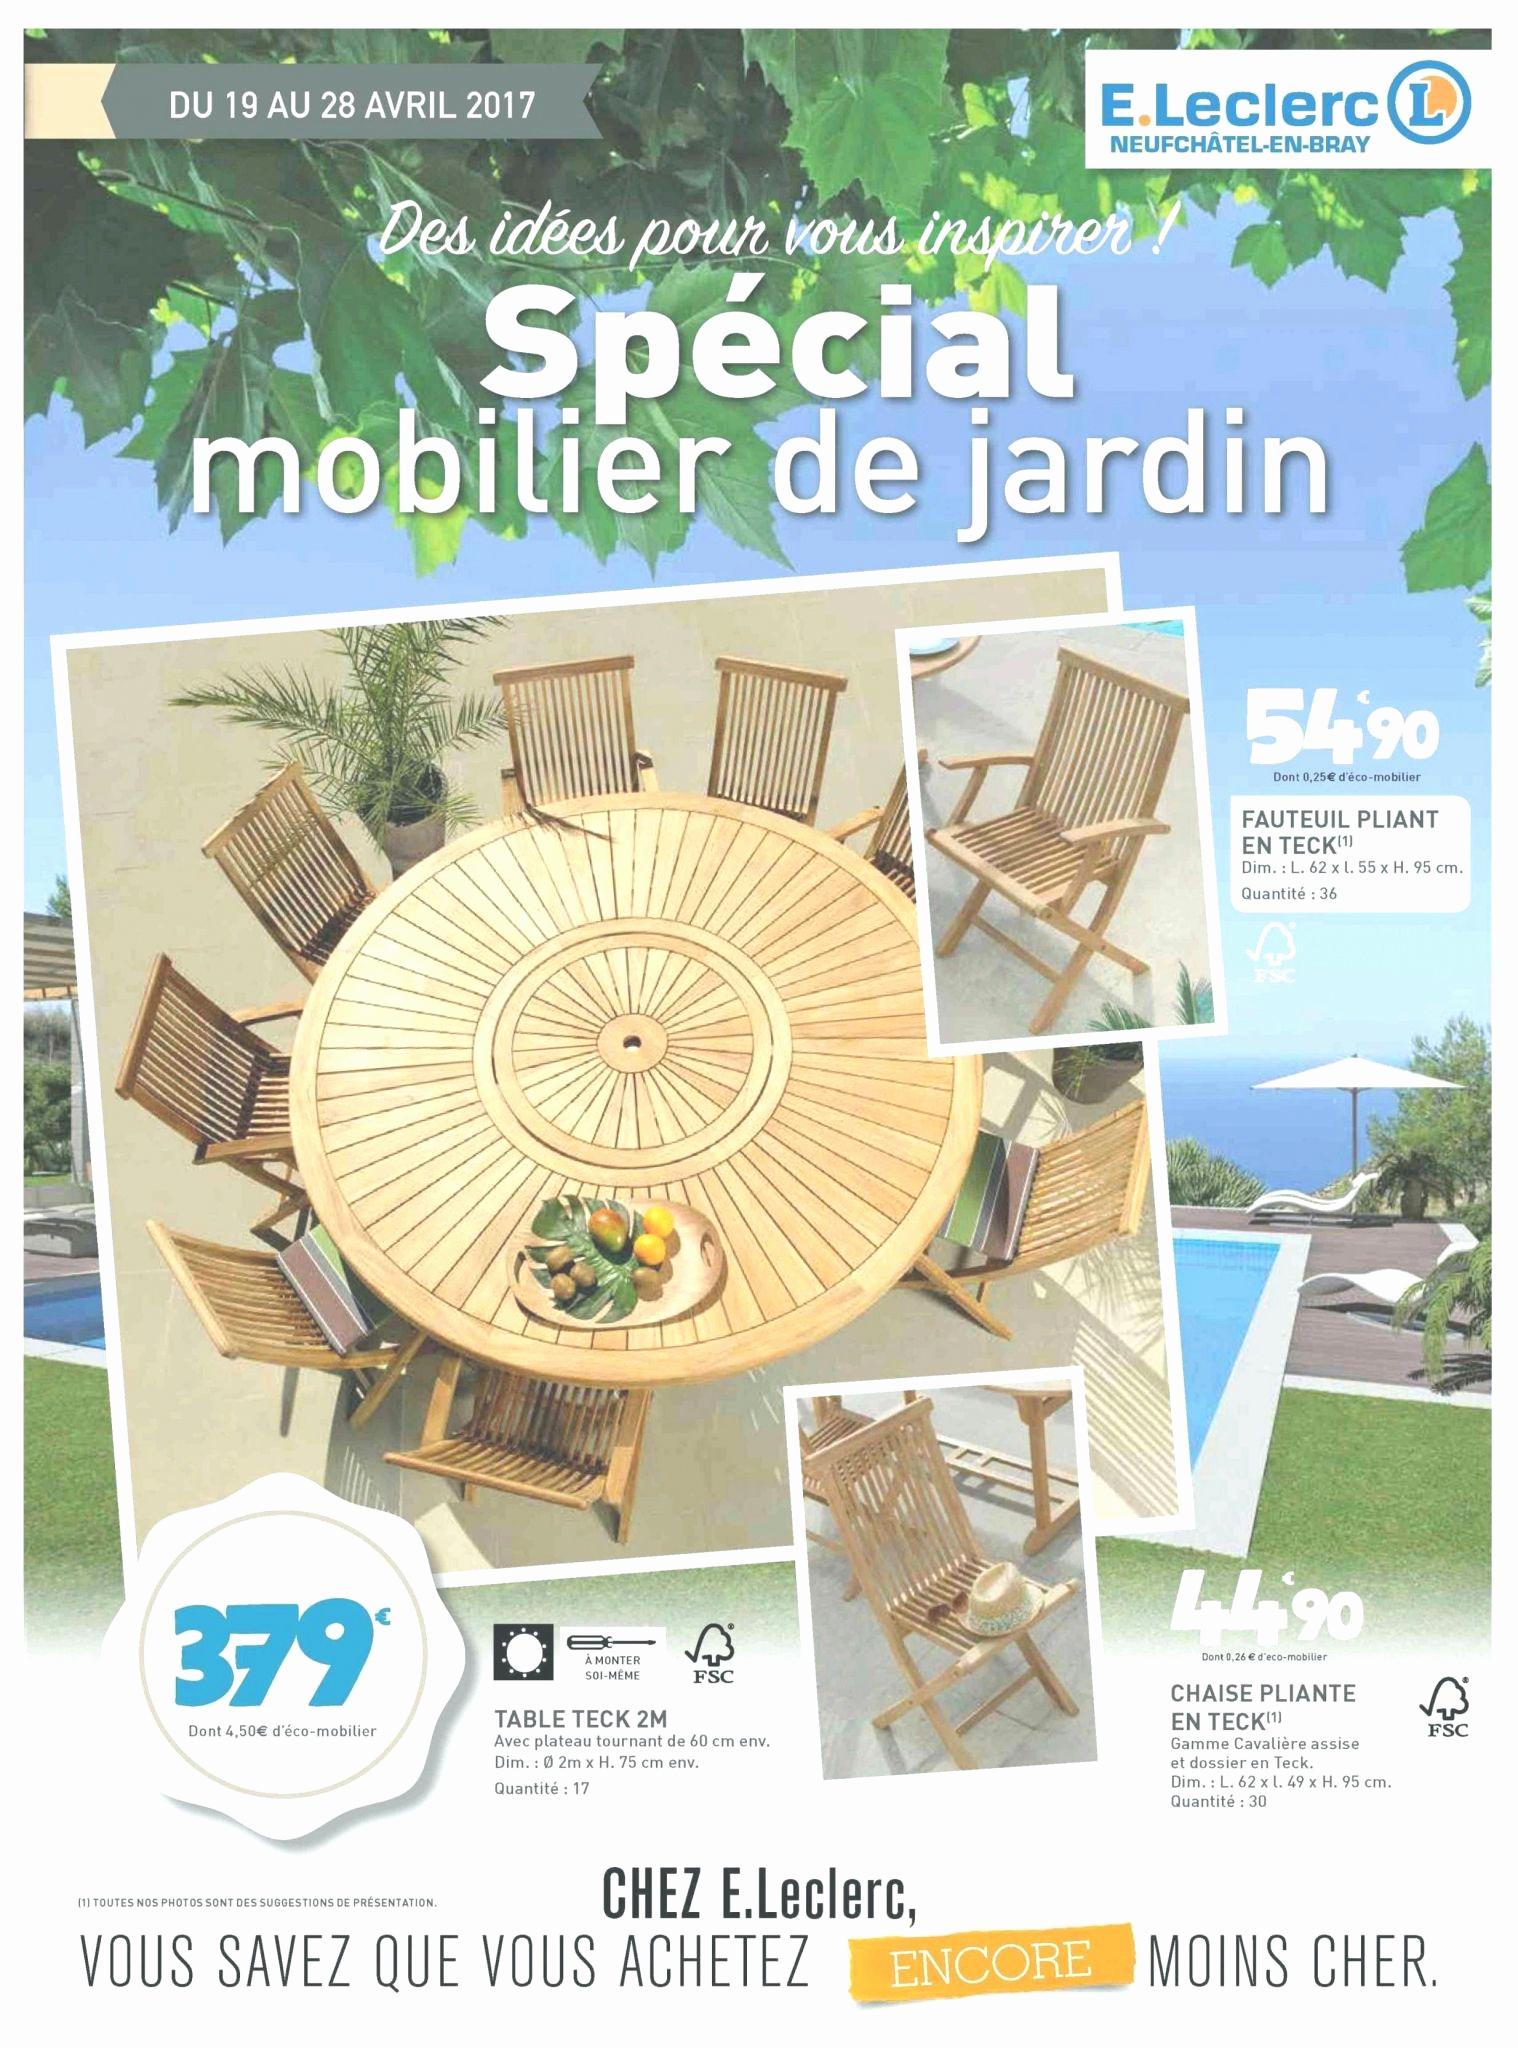 Assise Salon De Jardin Luxe Salon De Jardin Leclerc Catalogue 2017 Le Meilleur De Table